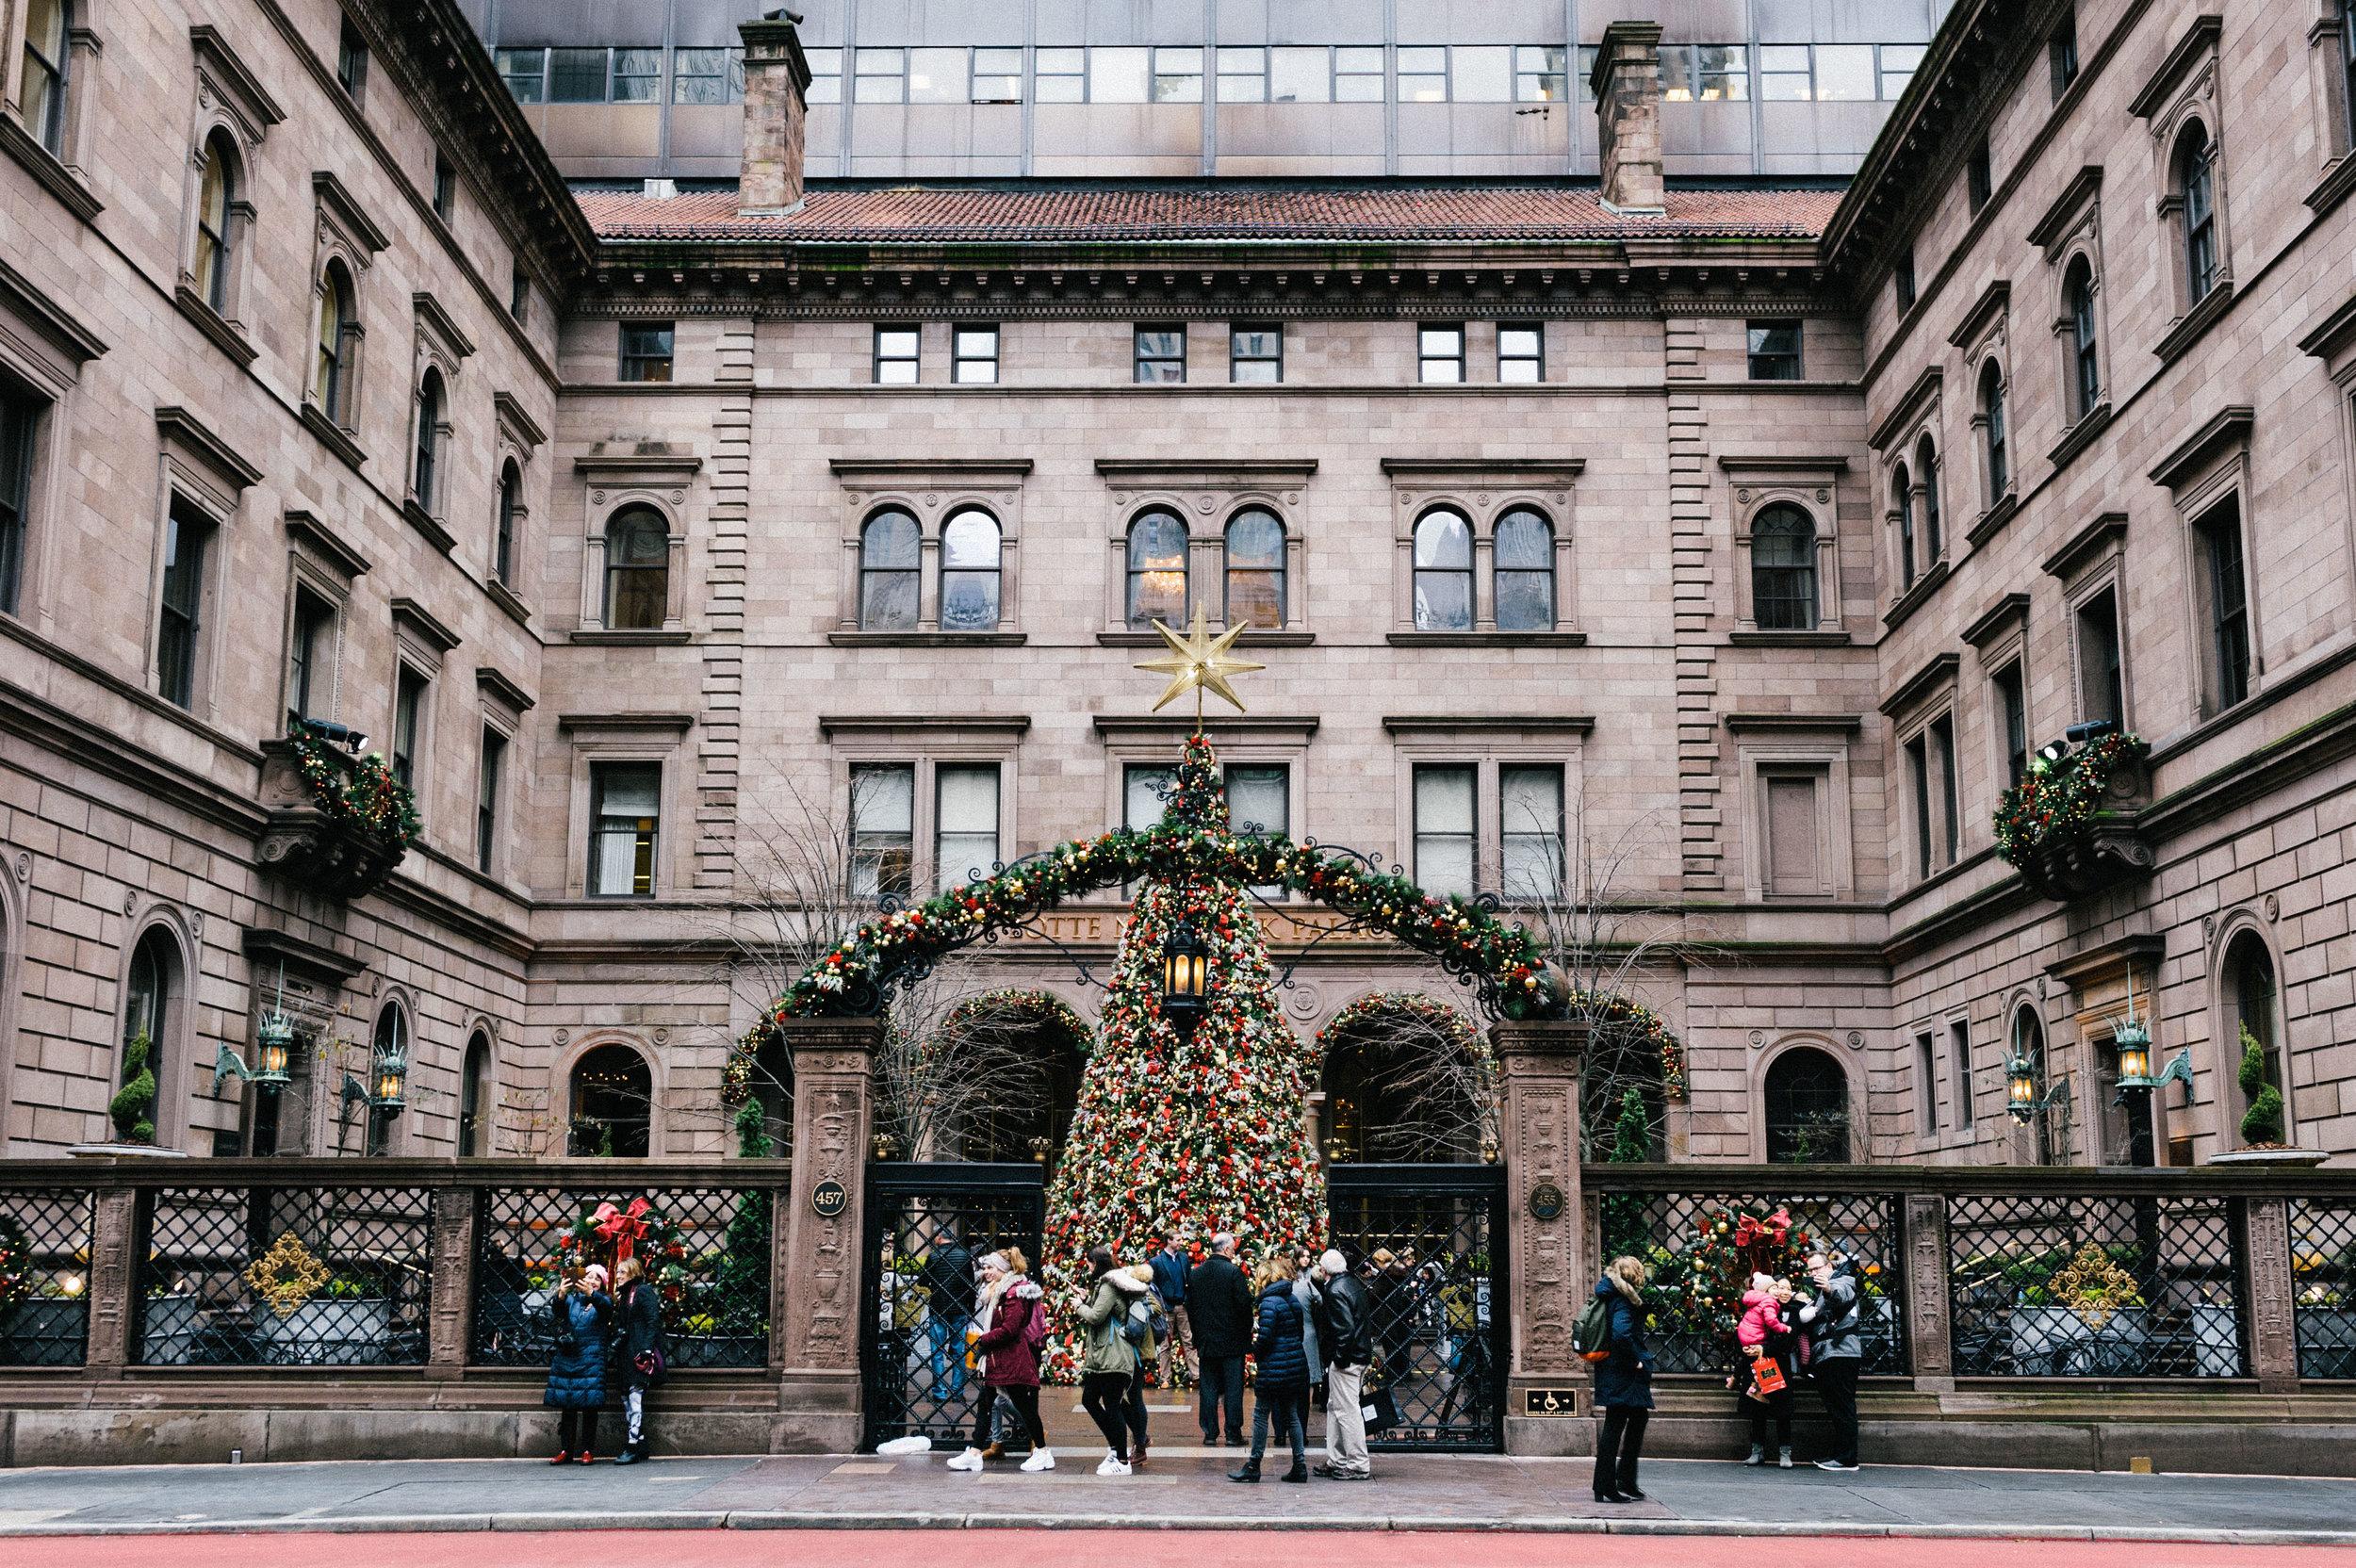 NYC December-1.jpg